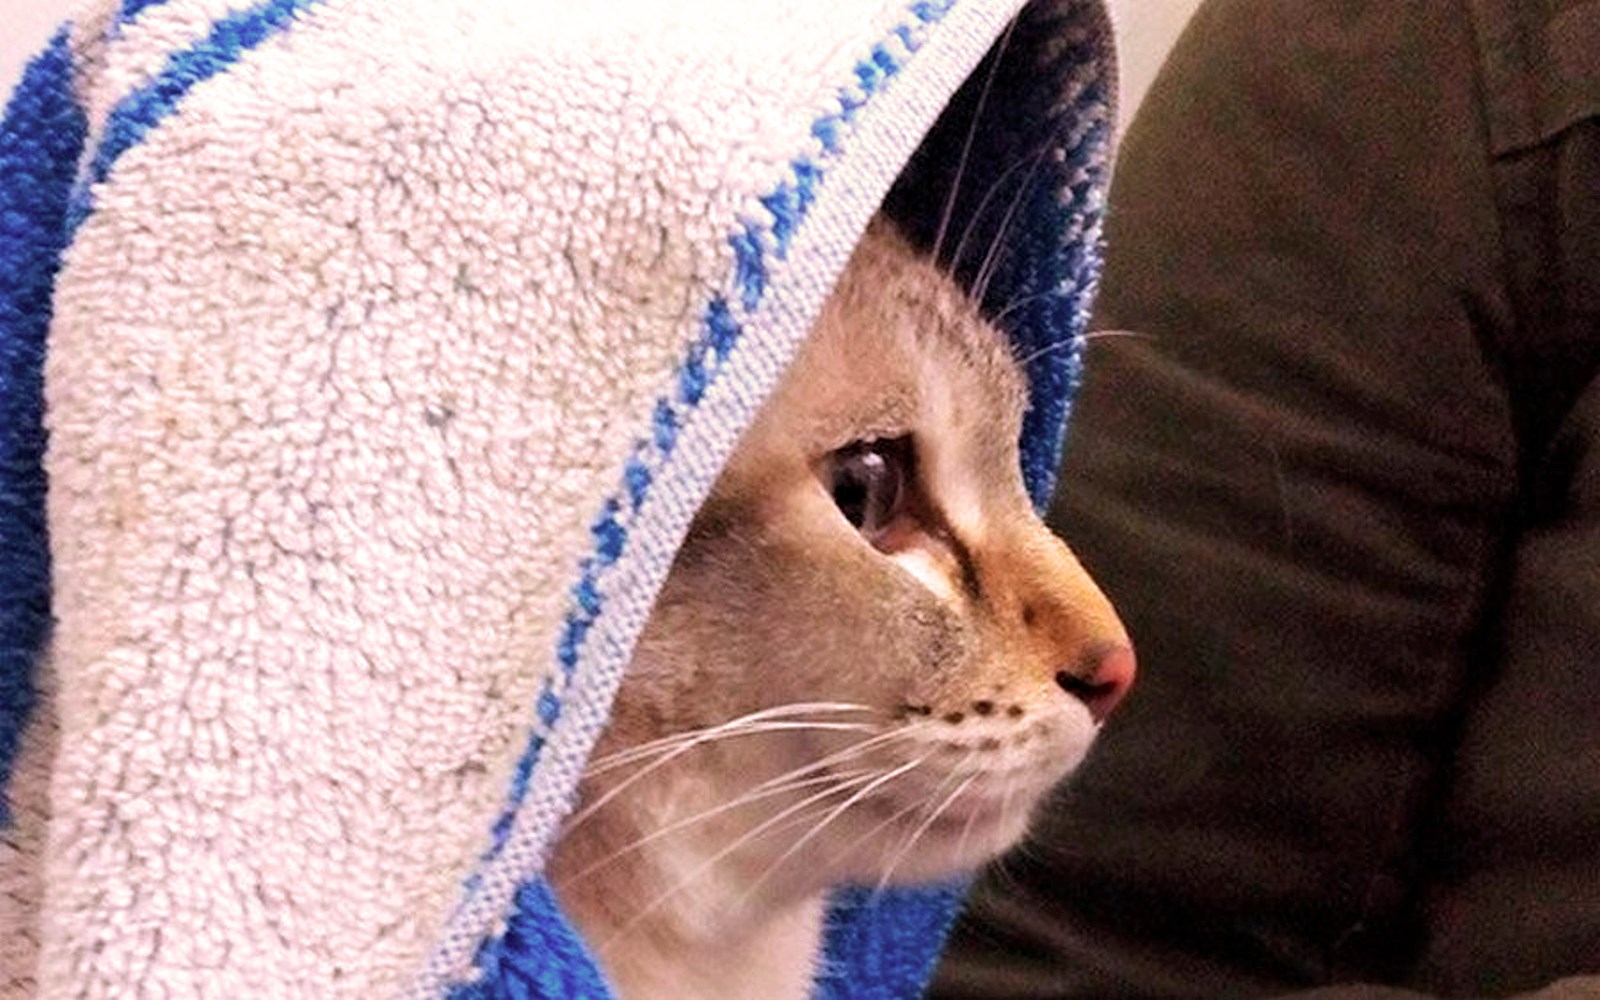 00 cat Obi Wan. 07.04.15